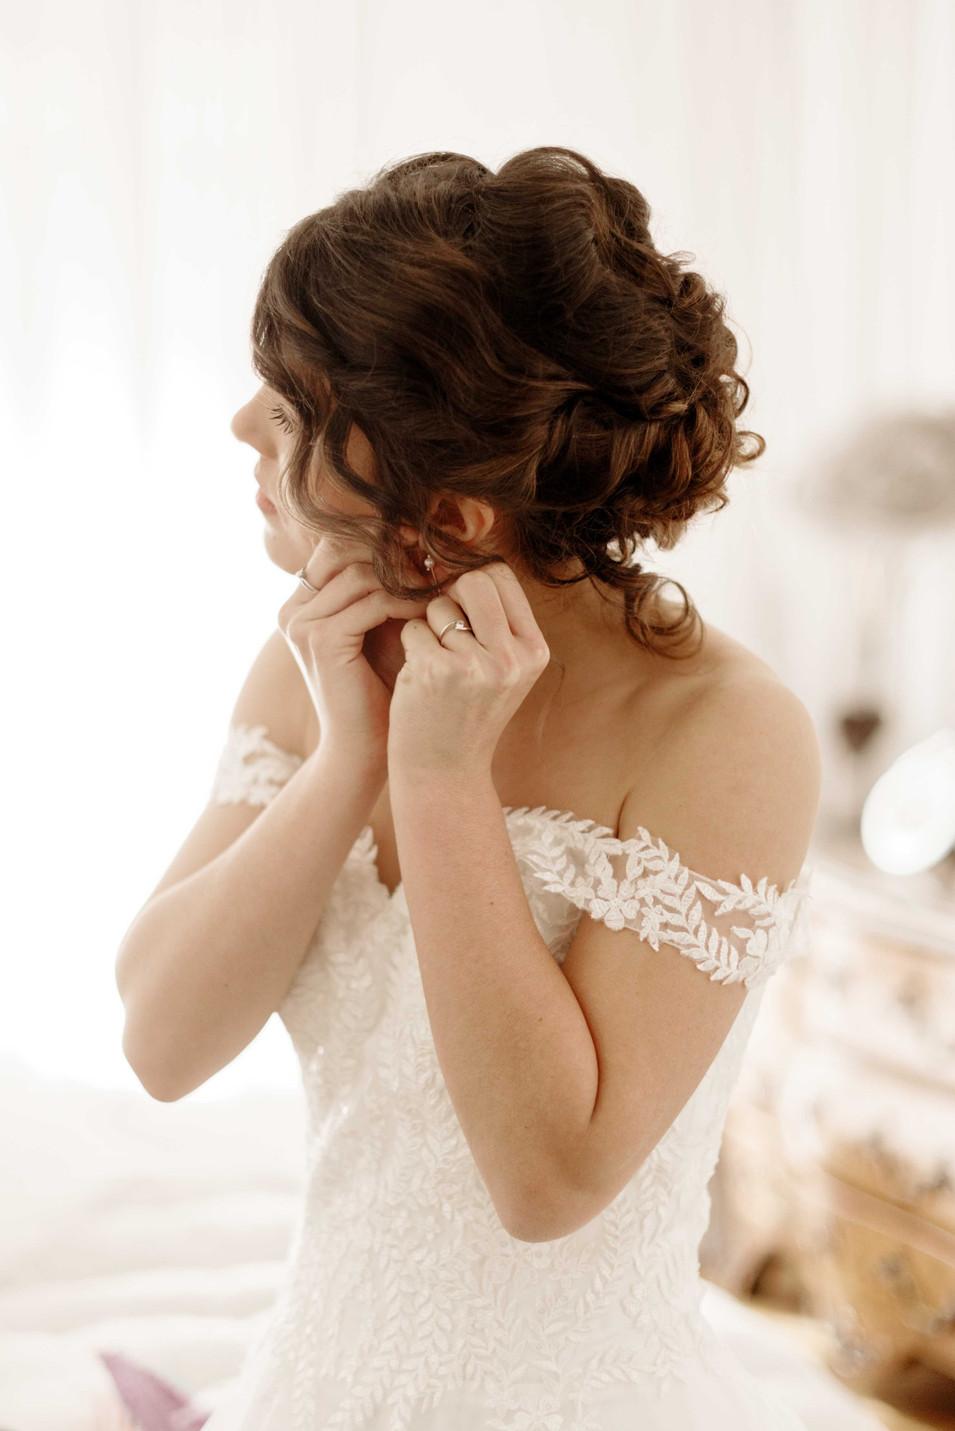 Photographe-mariage-aix-les-bains-46.jpg